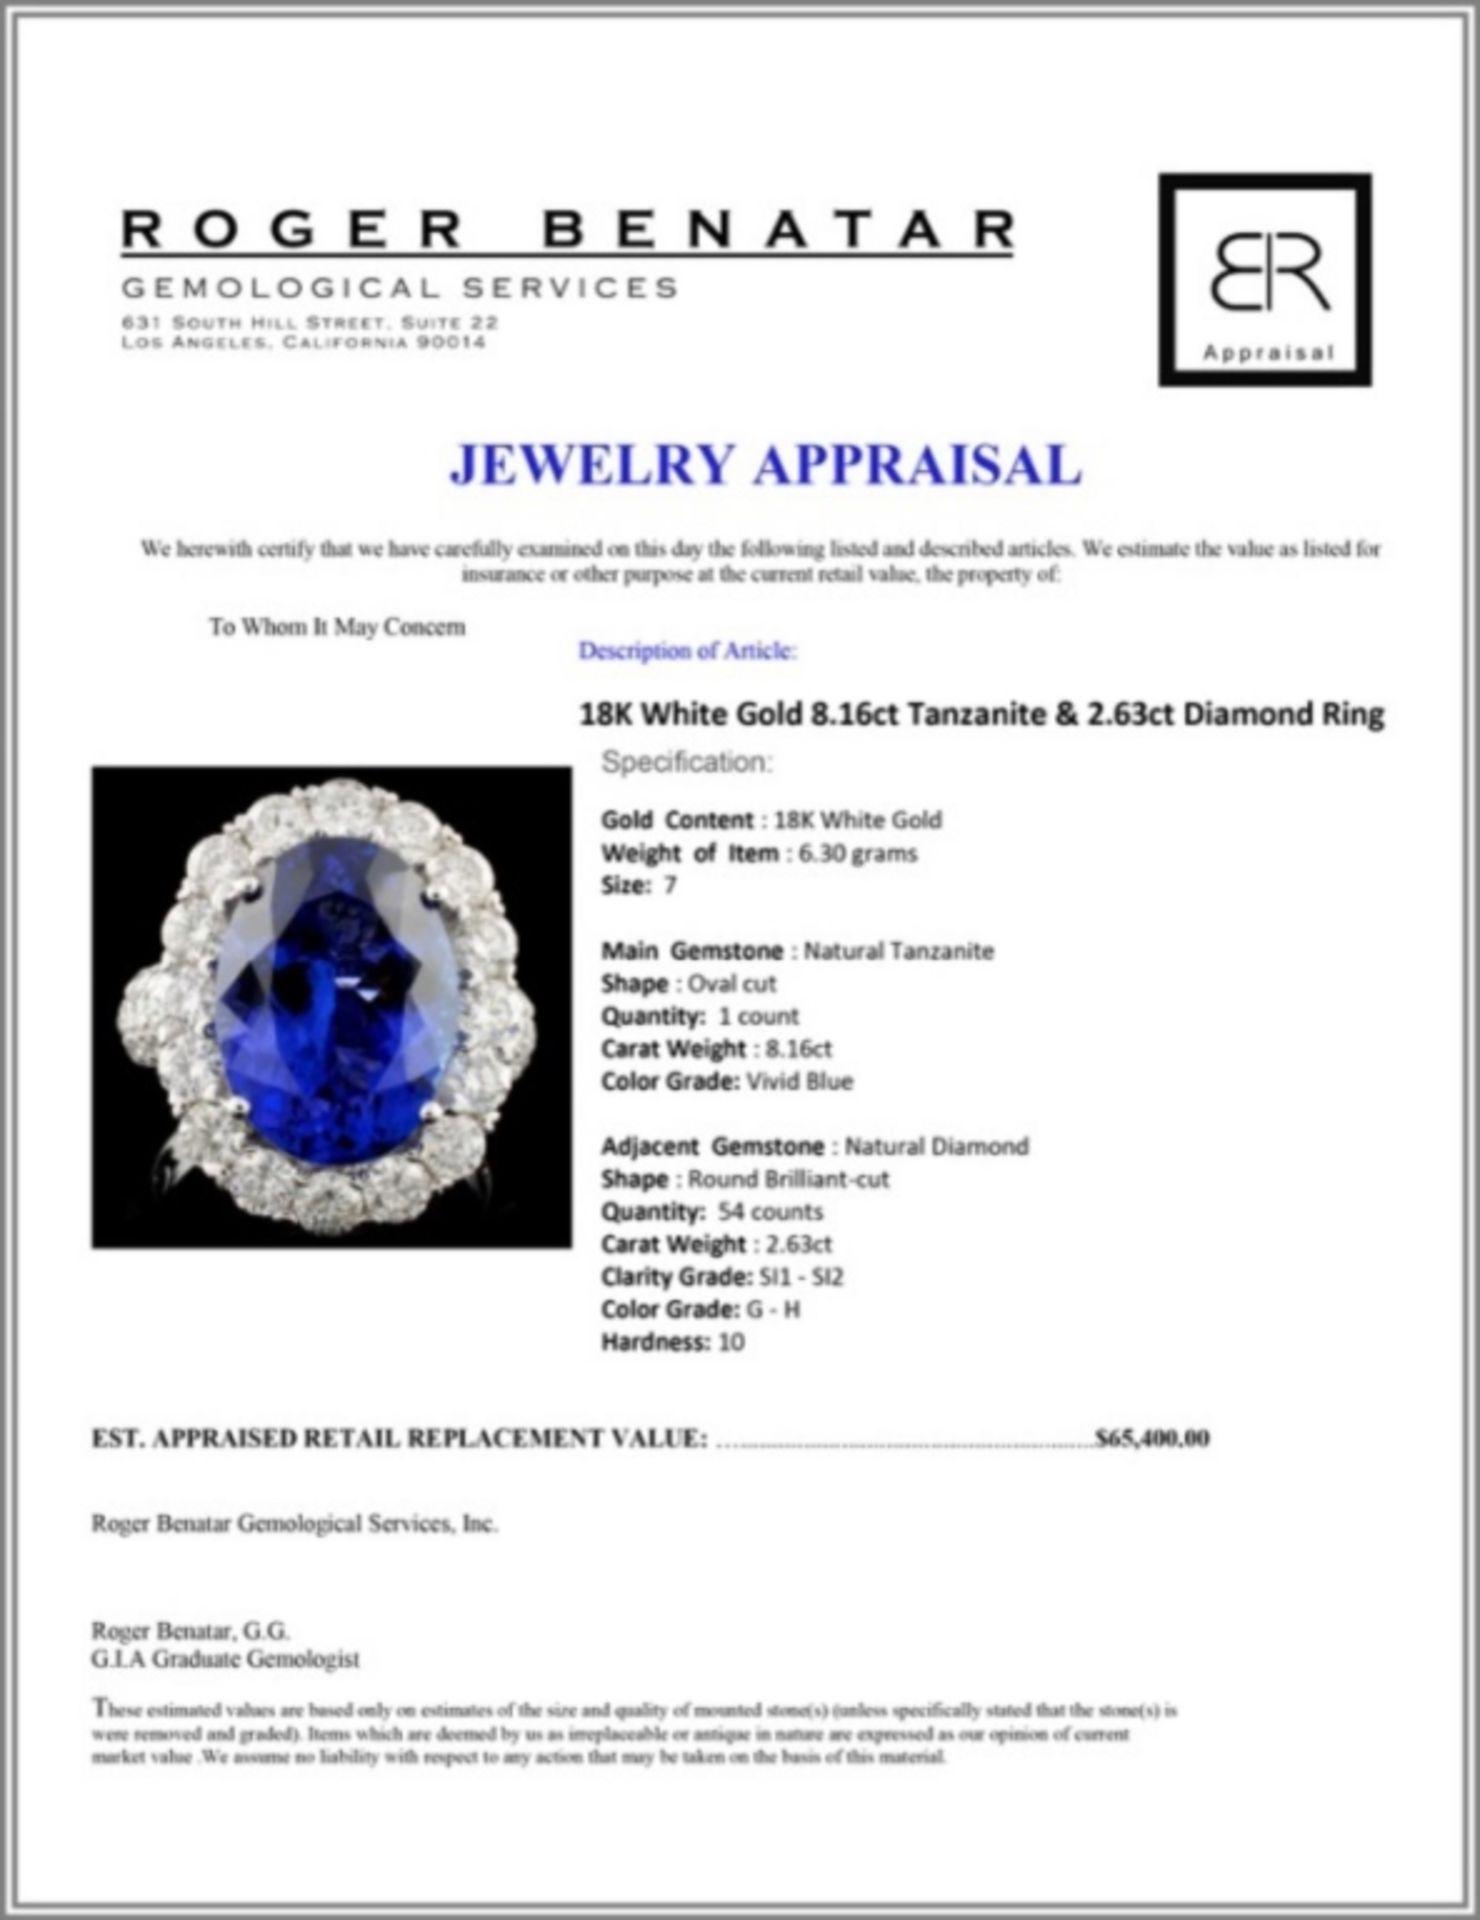 18K White Gold 8.16ct Tanzanite & 2.63ct Diamond R - Image 4 of 4